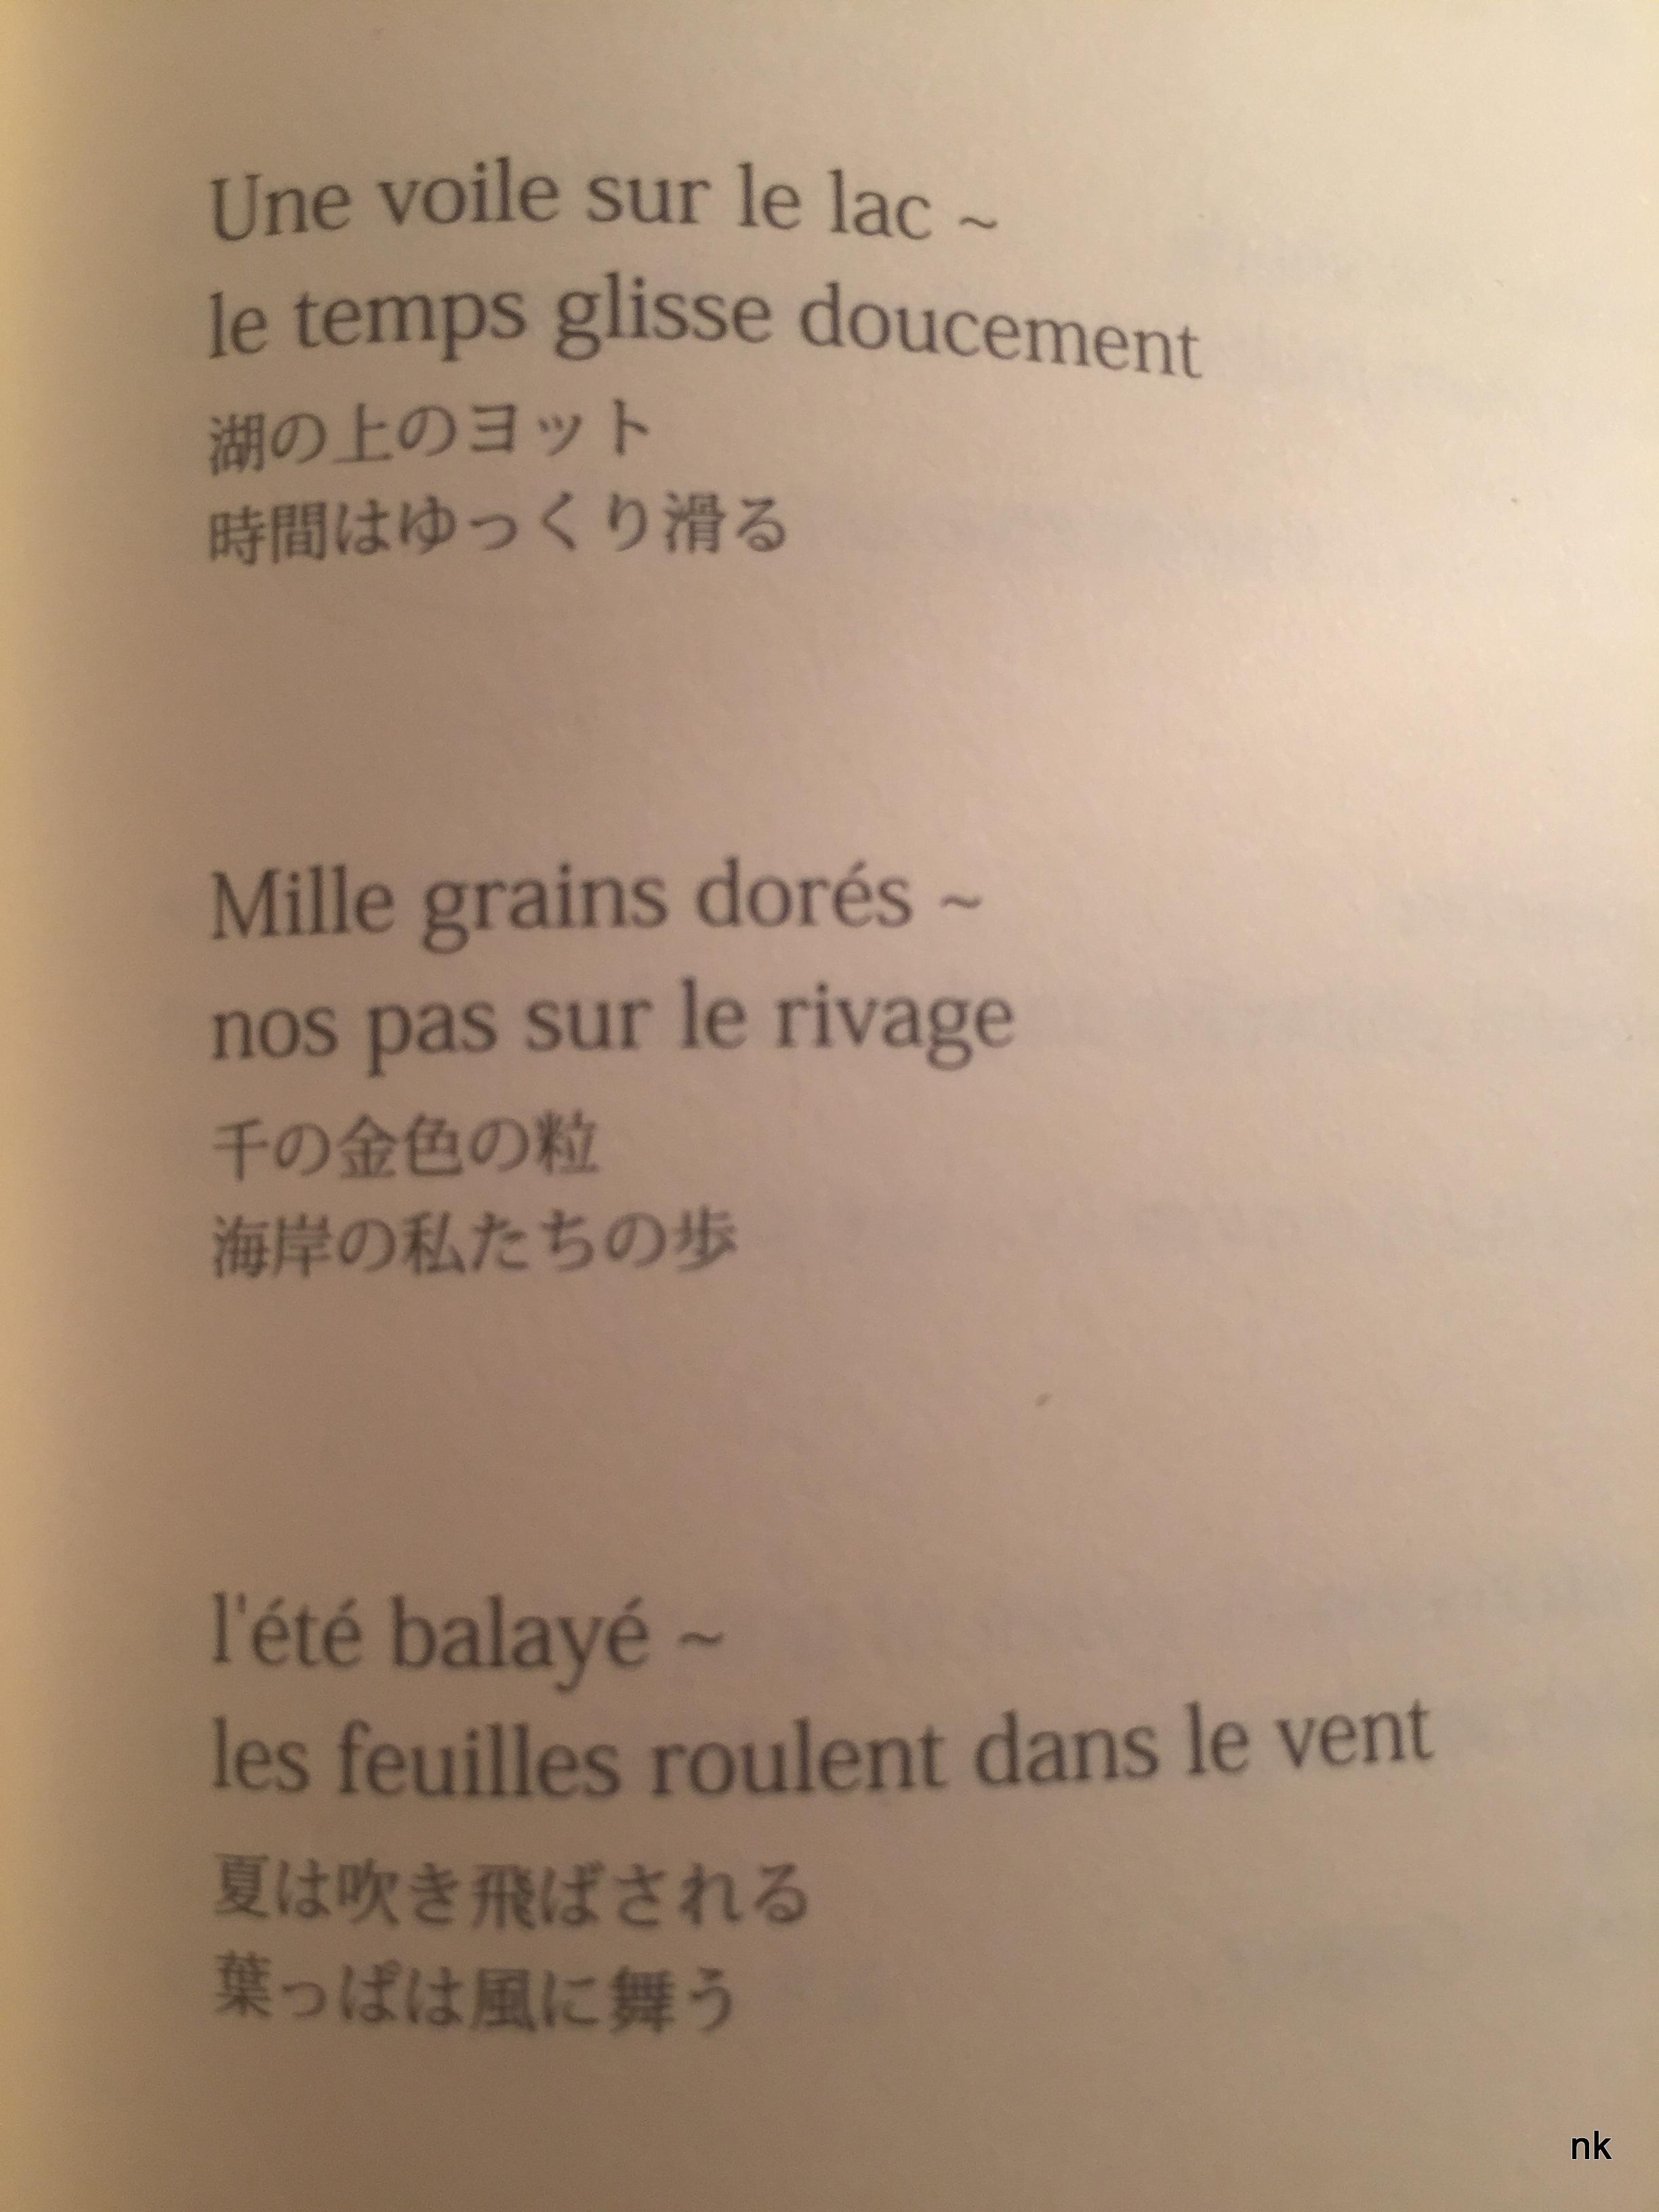 Mes haïkus traduits en japonais